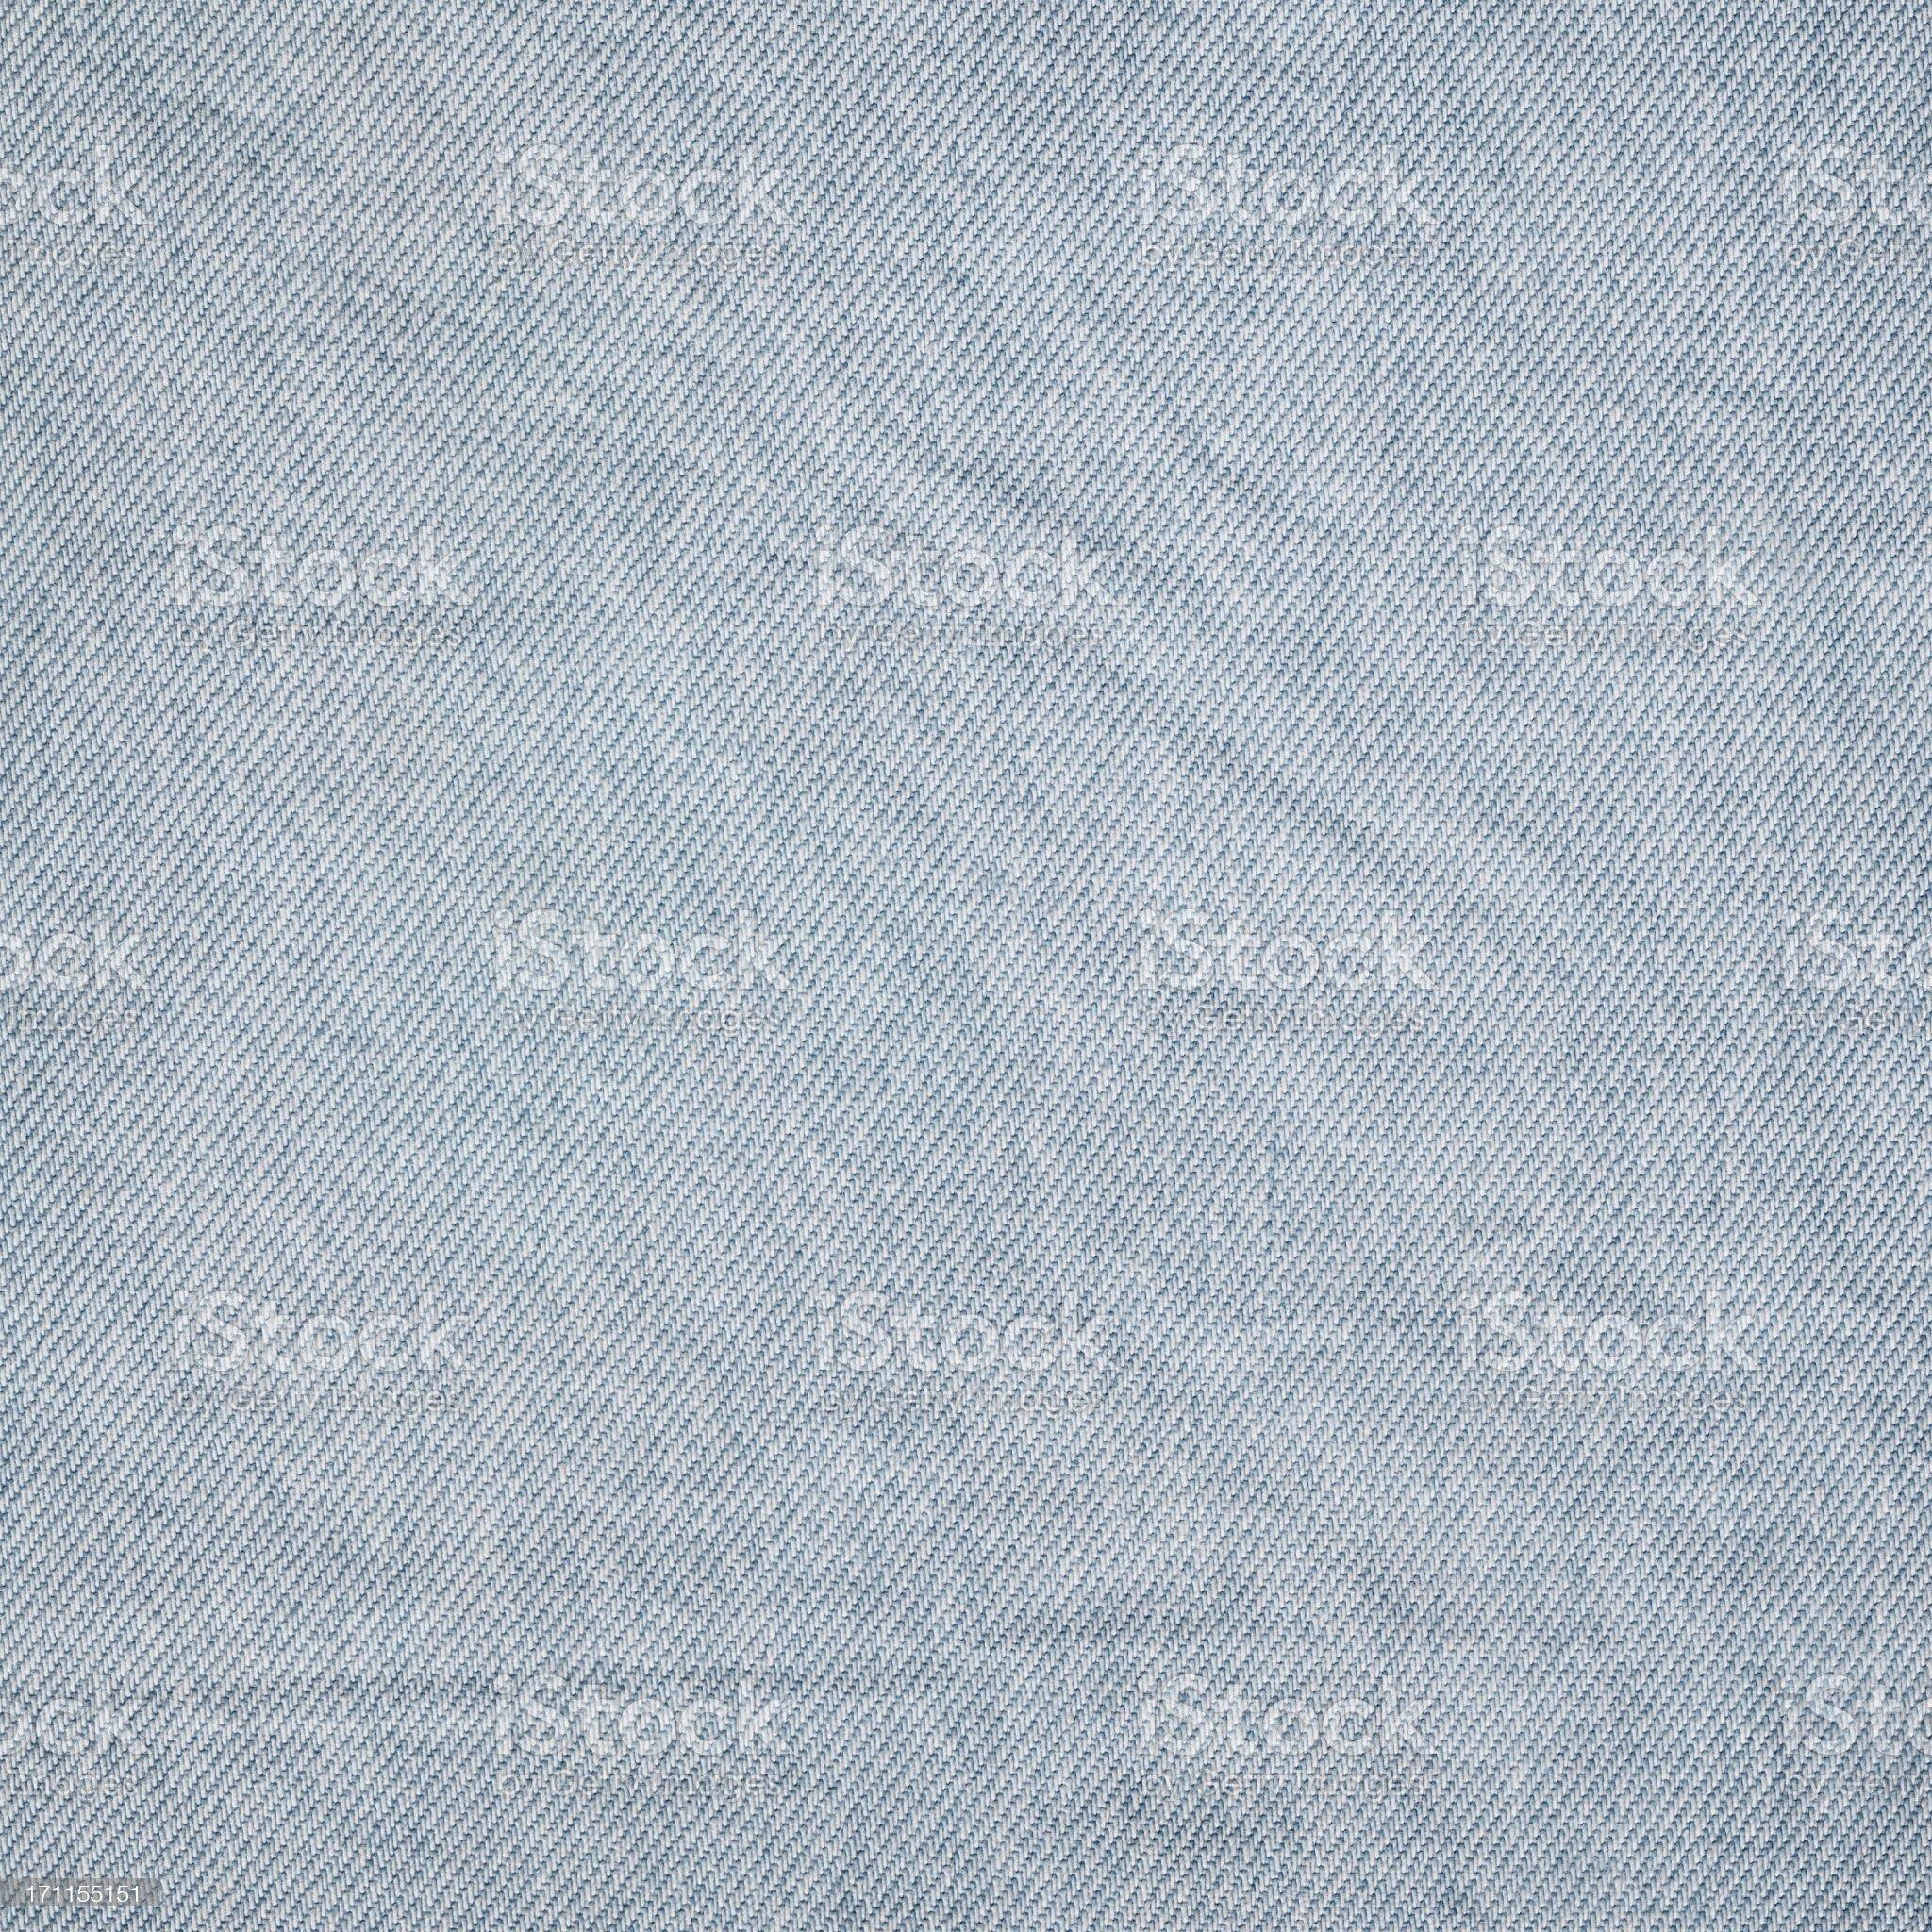 High Resolution Denim Light Blue Medium Coarse Texture Sample royalty-free stock photo